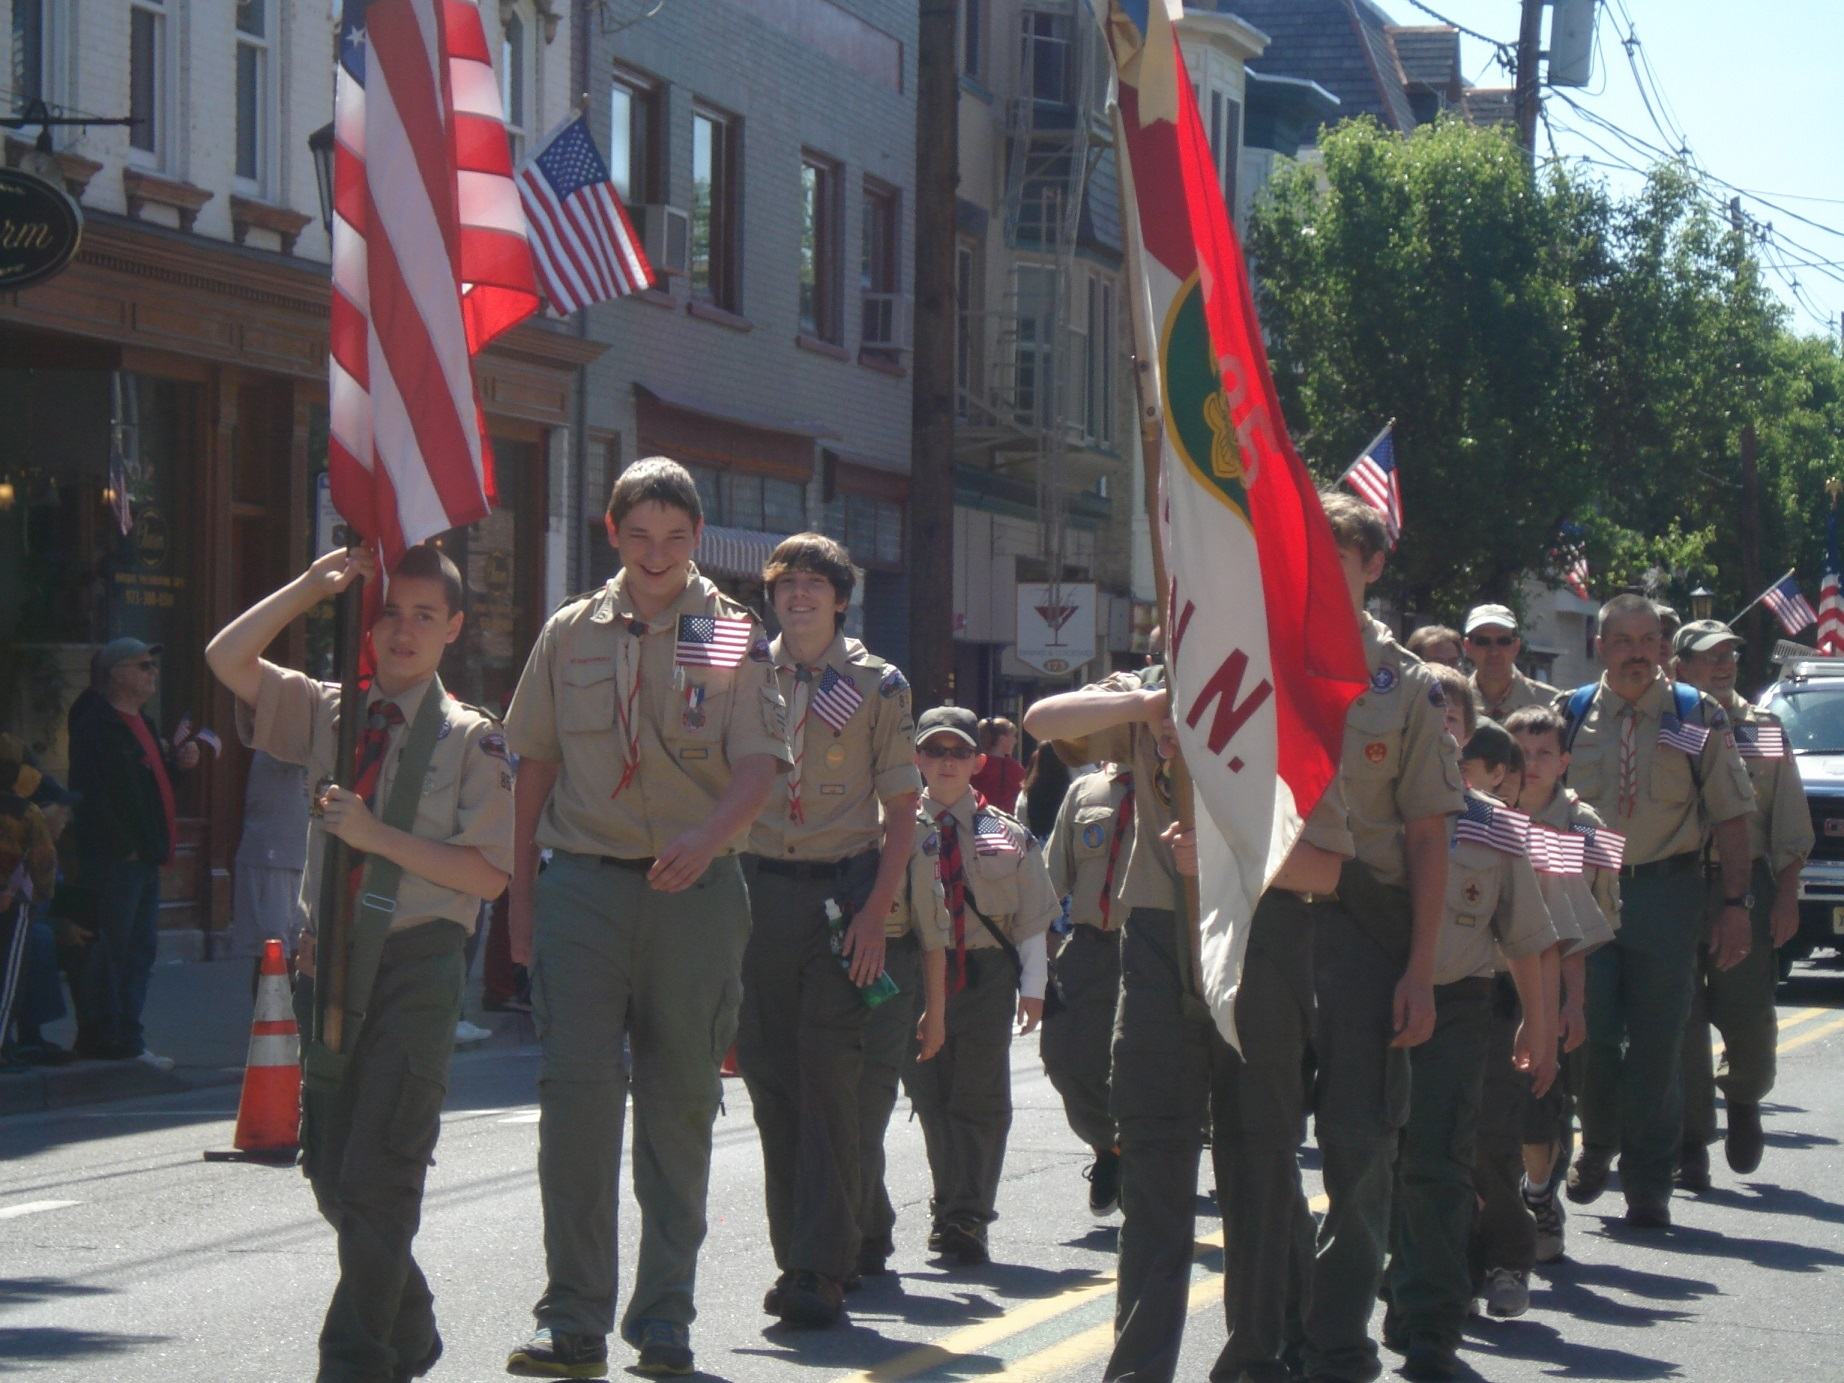 b69b60916e5f3d82d648_Memorial_Day_Parade_014.JPG